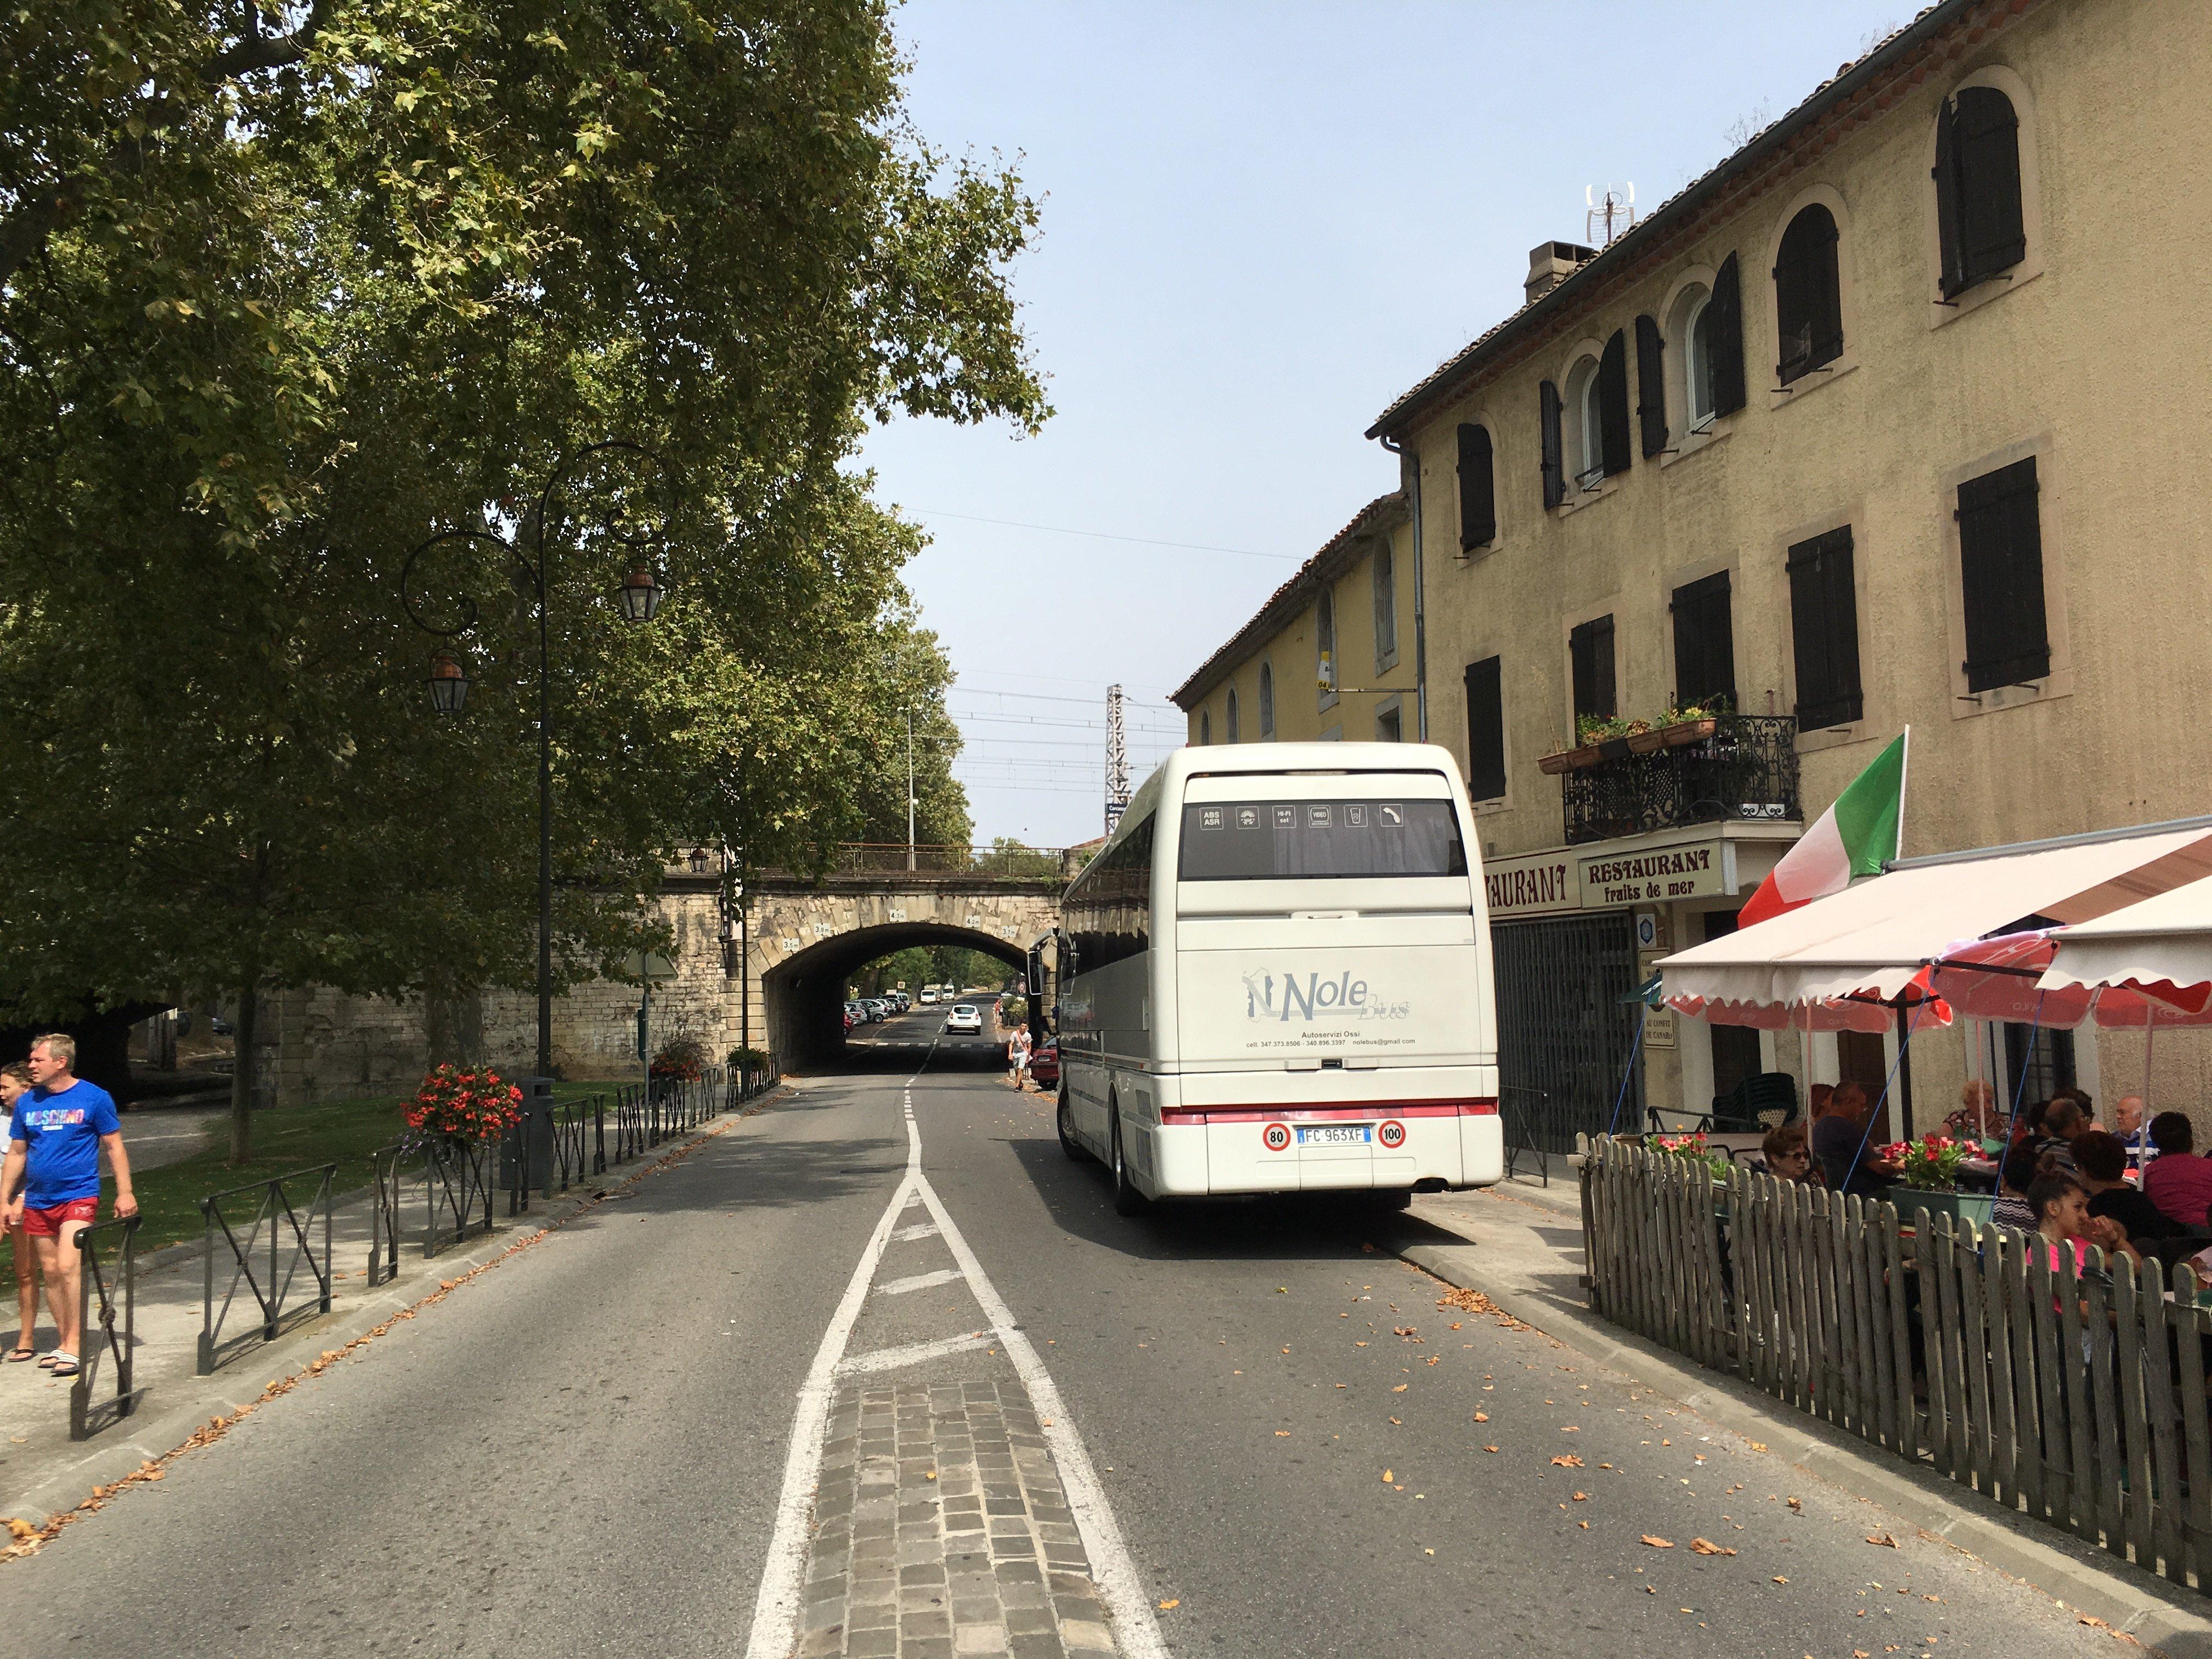 autobus che cammina su strada nolobus